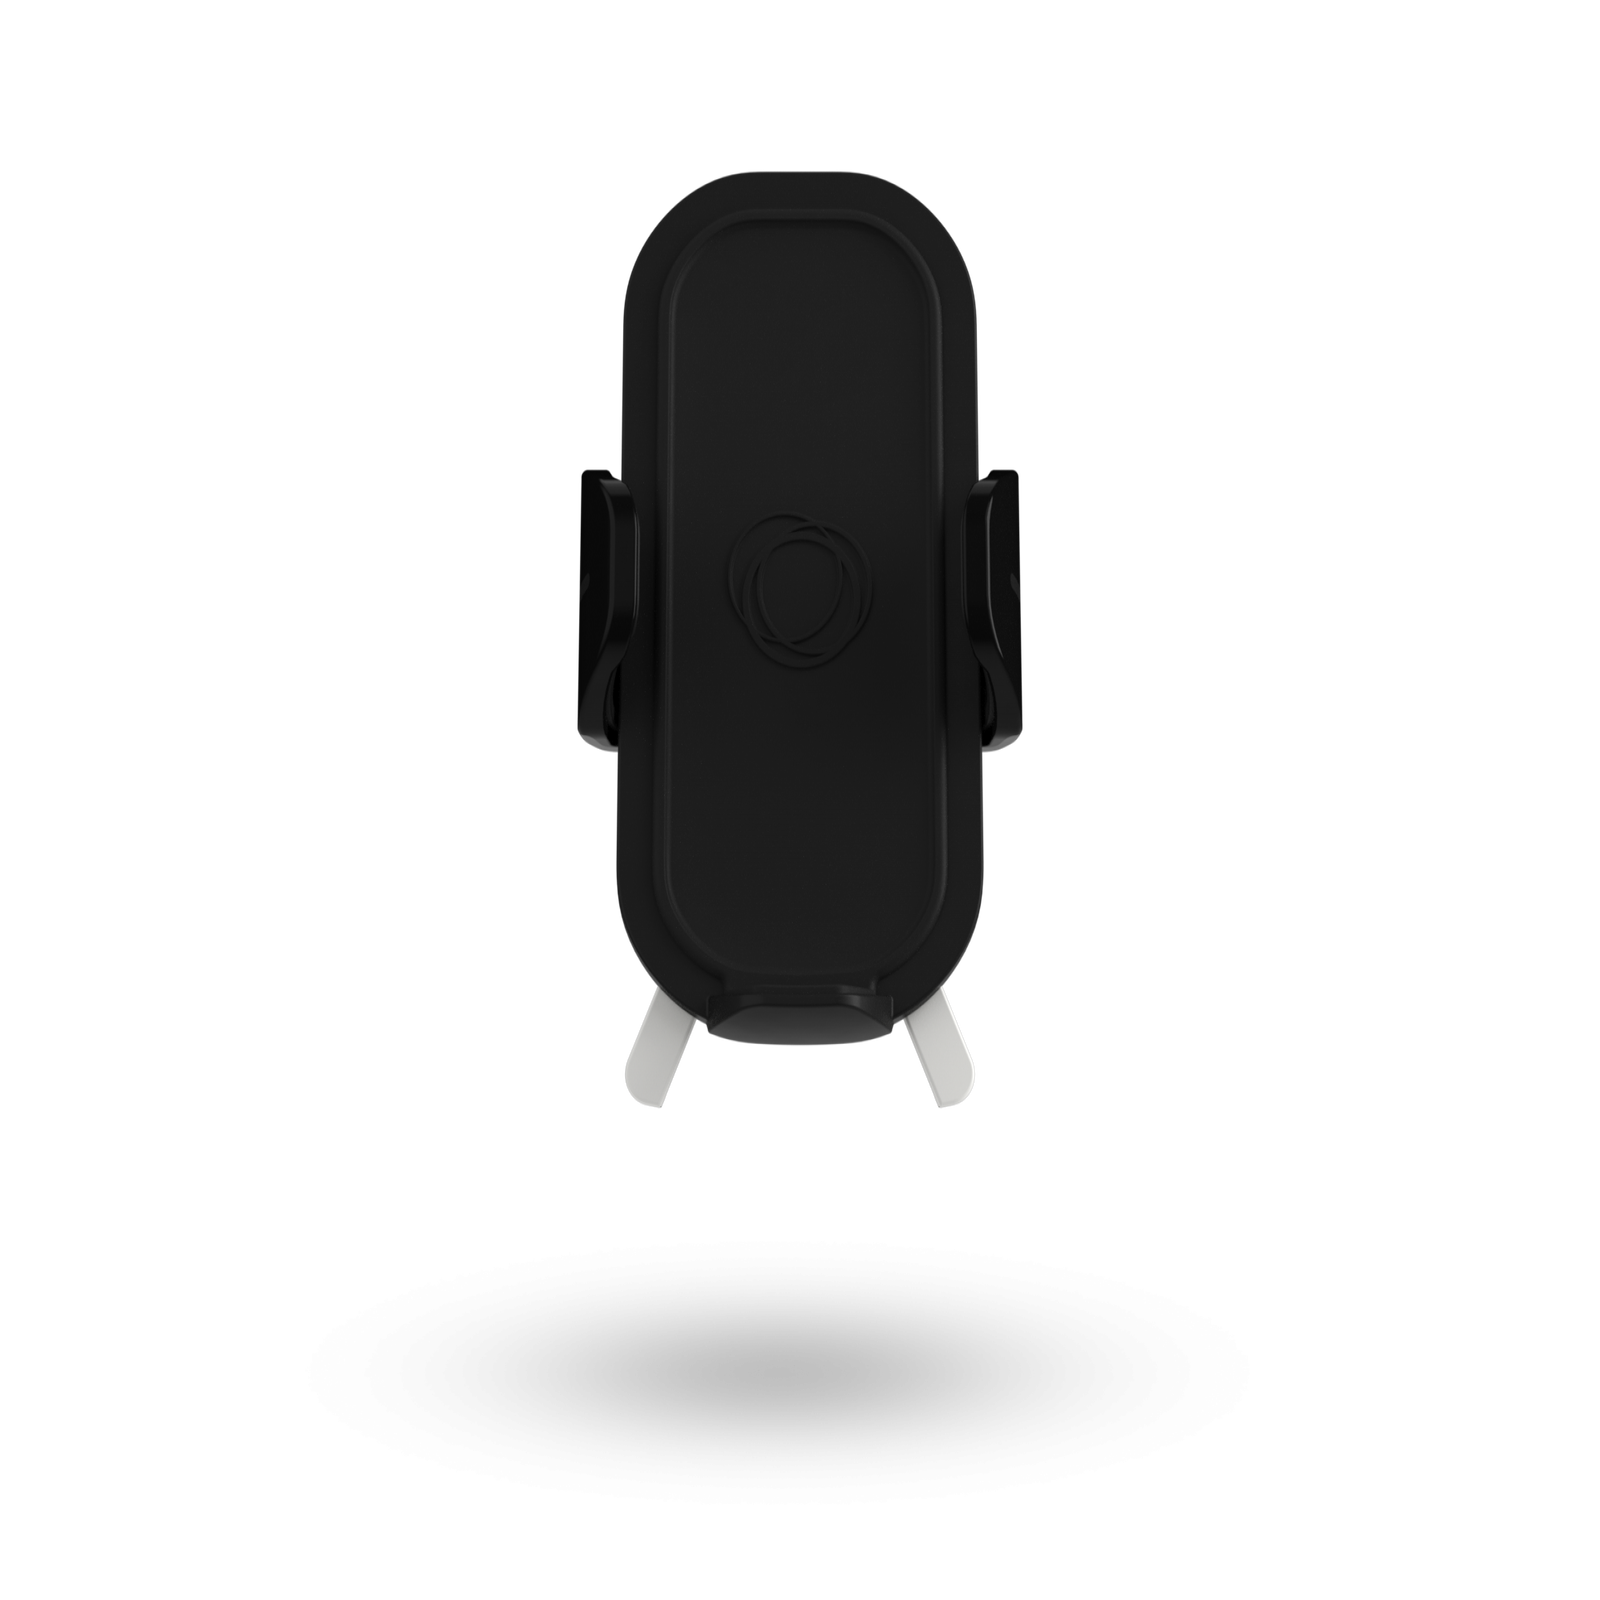 Bugaboo support smartphone